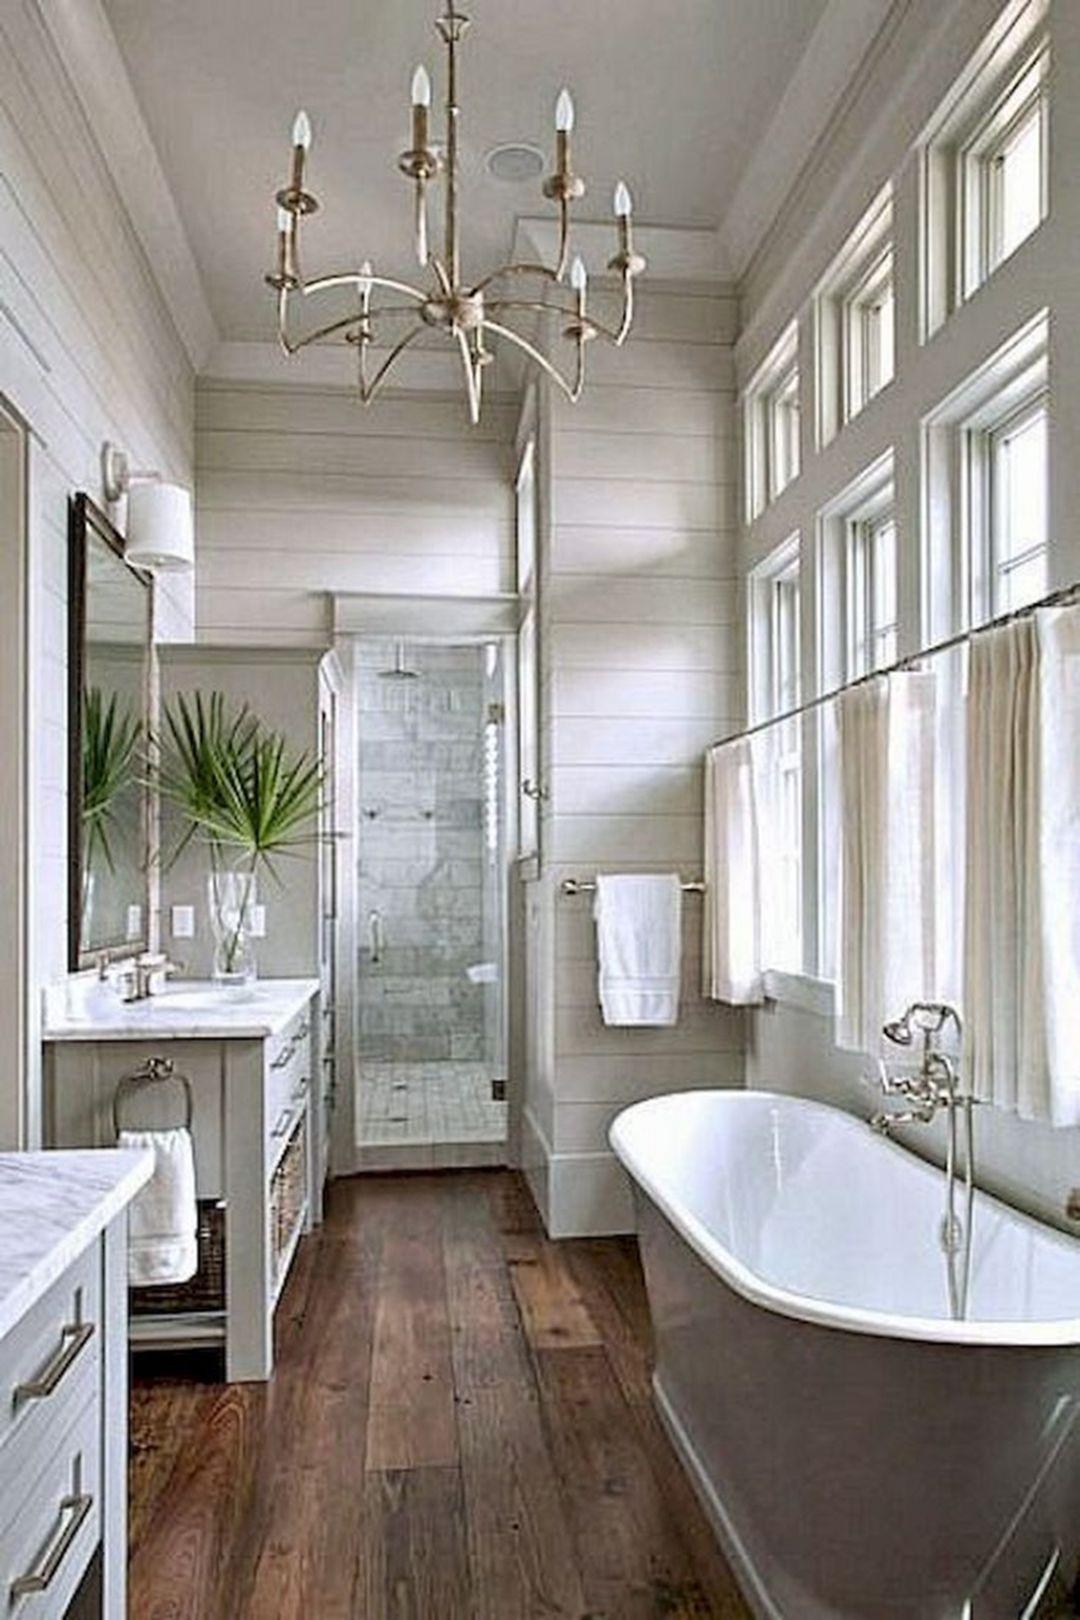 10 Impressive French Country Bathroom Design Ideas For Your Inspiration Farmhouse Master Bathroom Bathroom Remodel Master Modern Farmhouse Bathroom